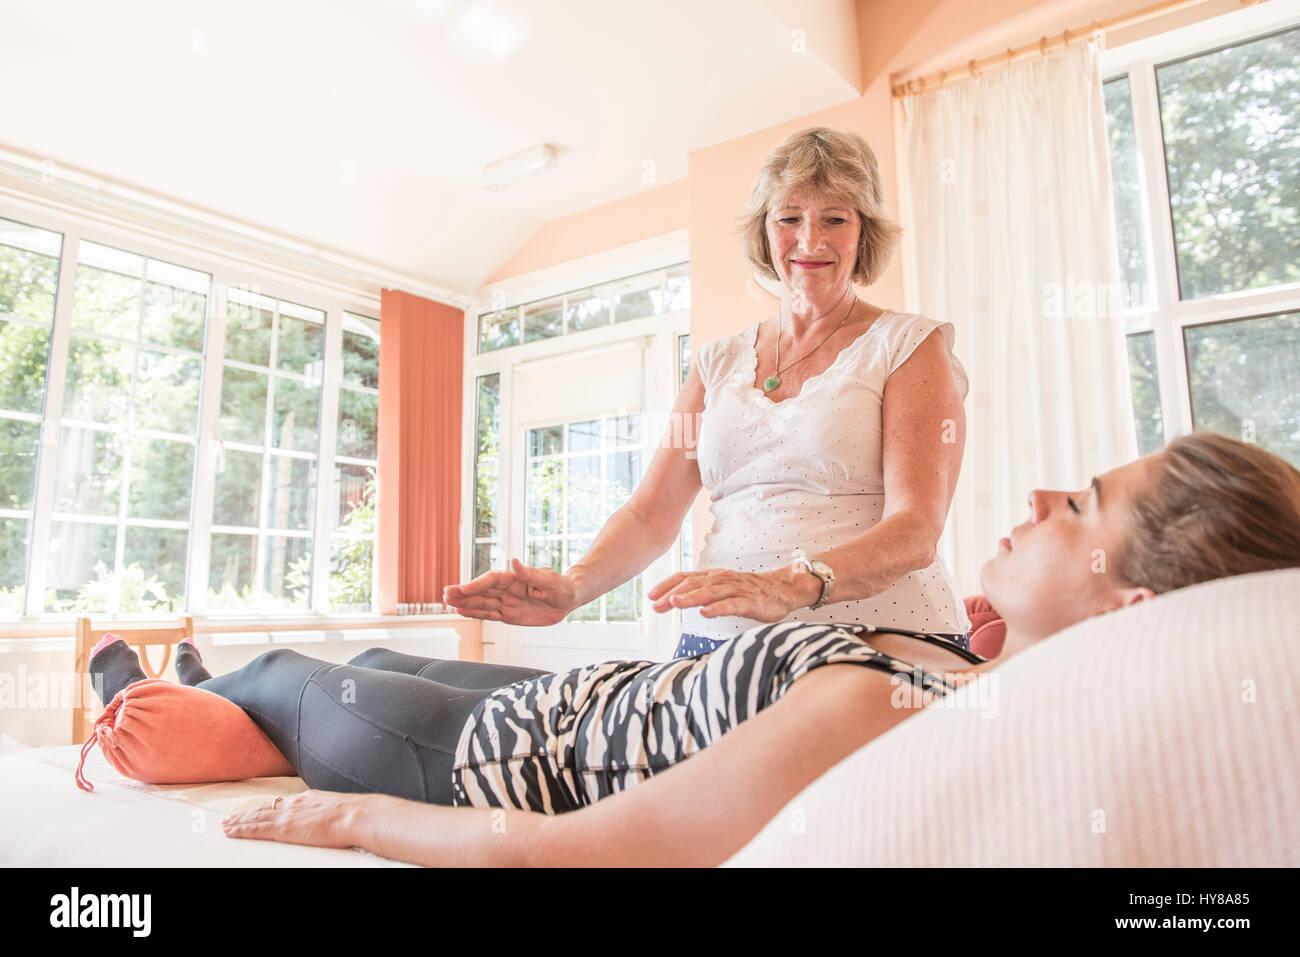 A spiritual healer at work - Stock Image